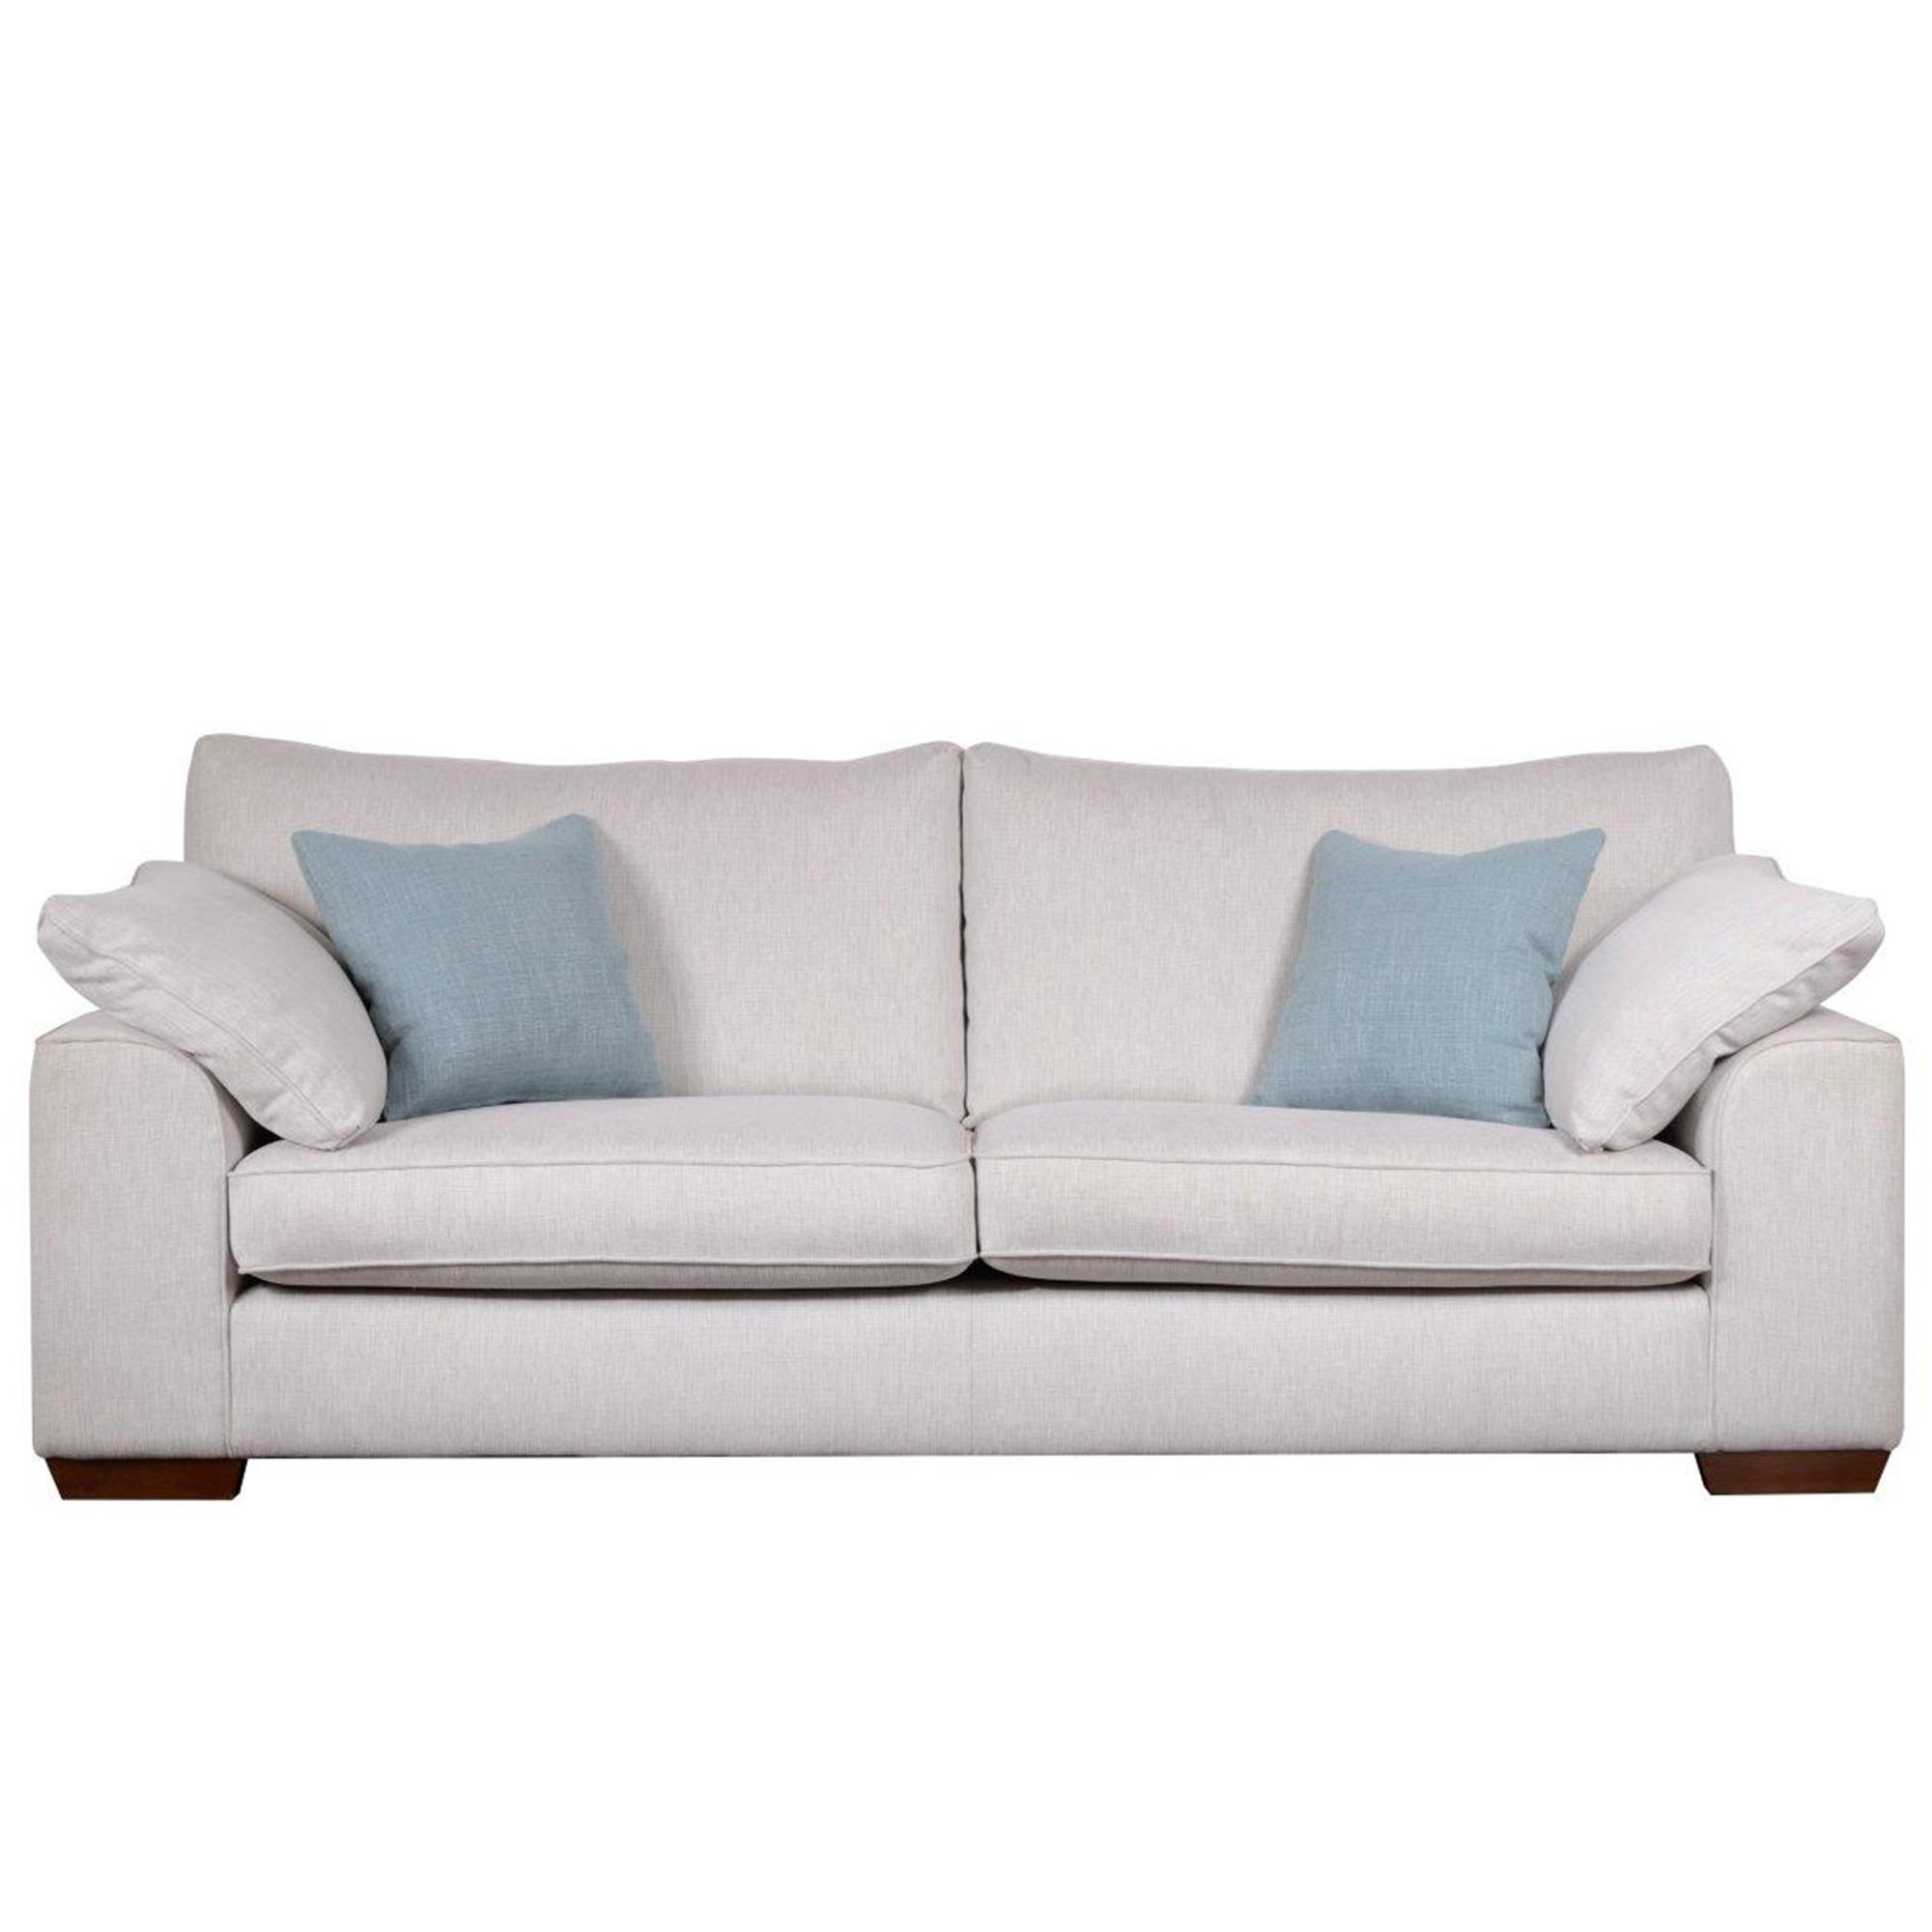 Michigan Extra Large Sofa Fabric Sofas Cookes Furniture